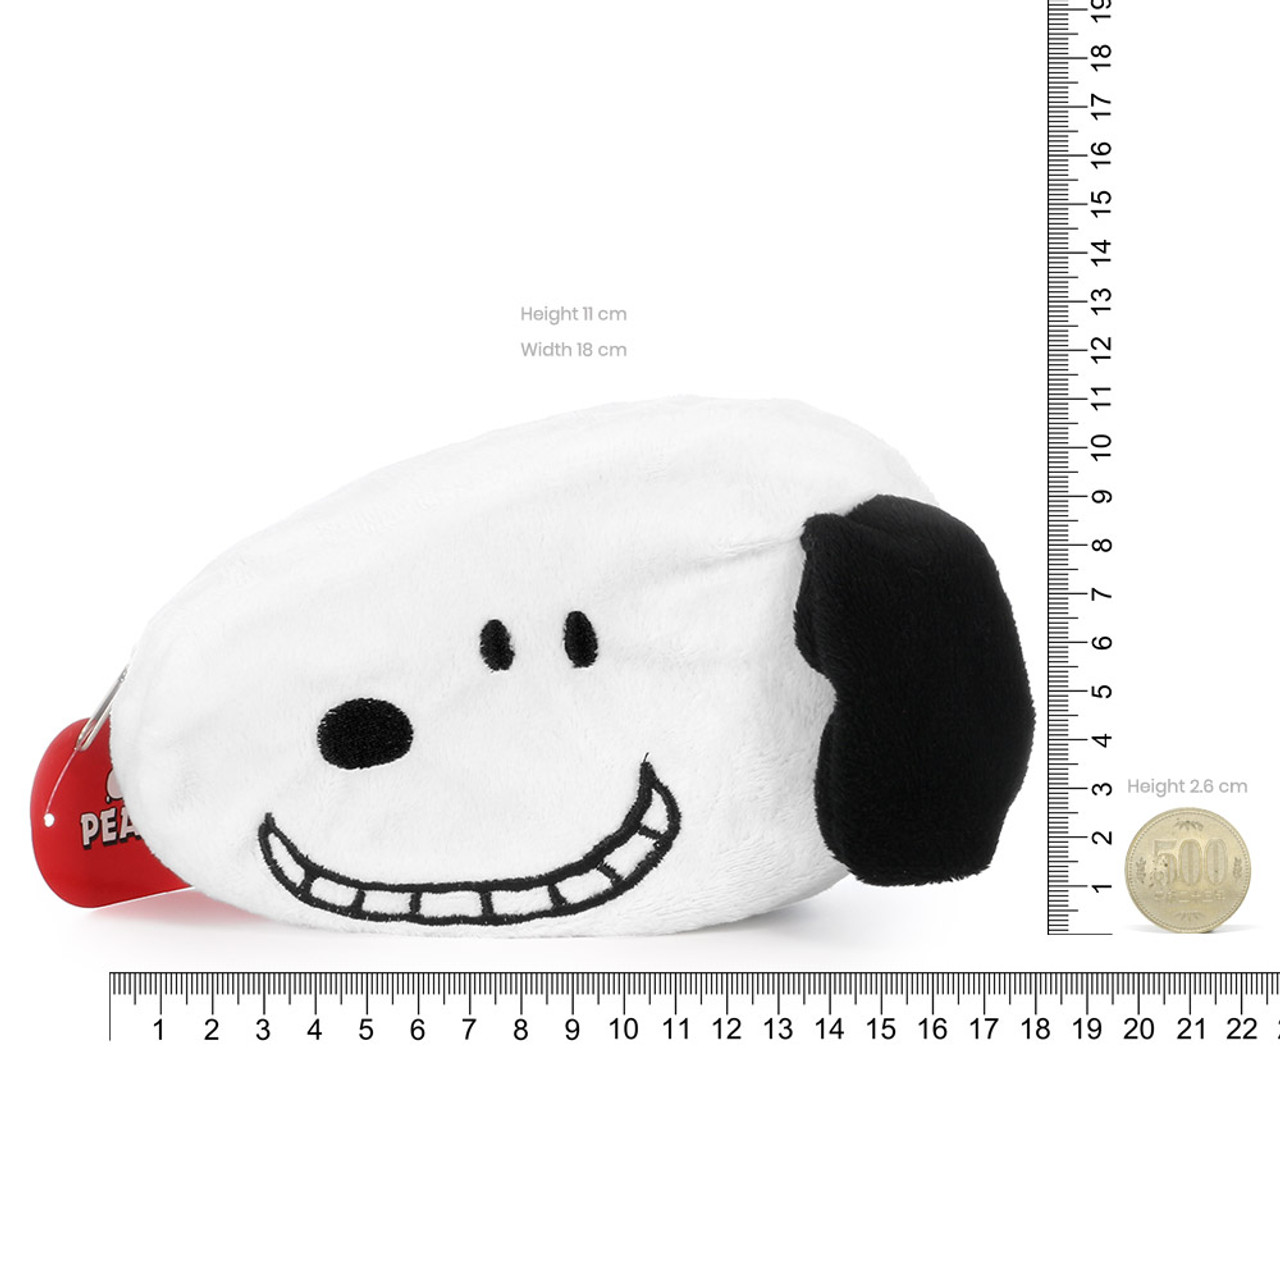 25 cm Peanuts Snoopy Collection Pl/üsch Snoopy